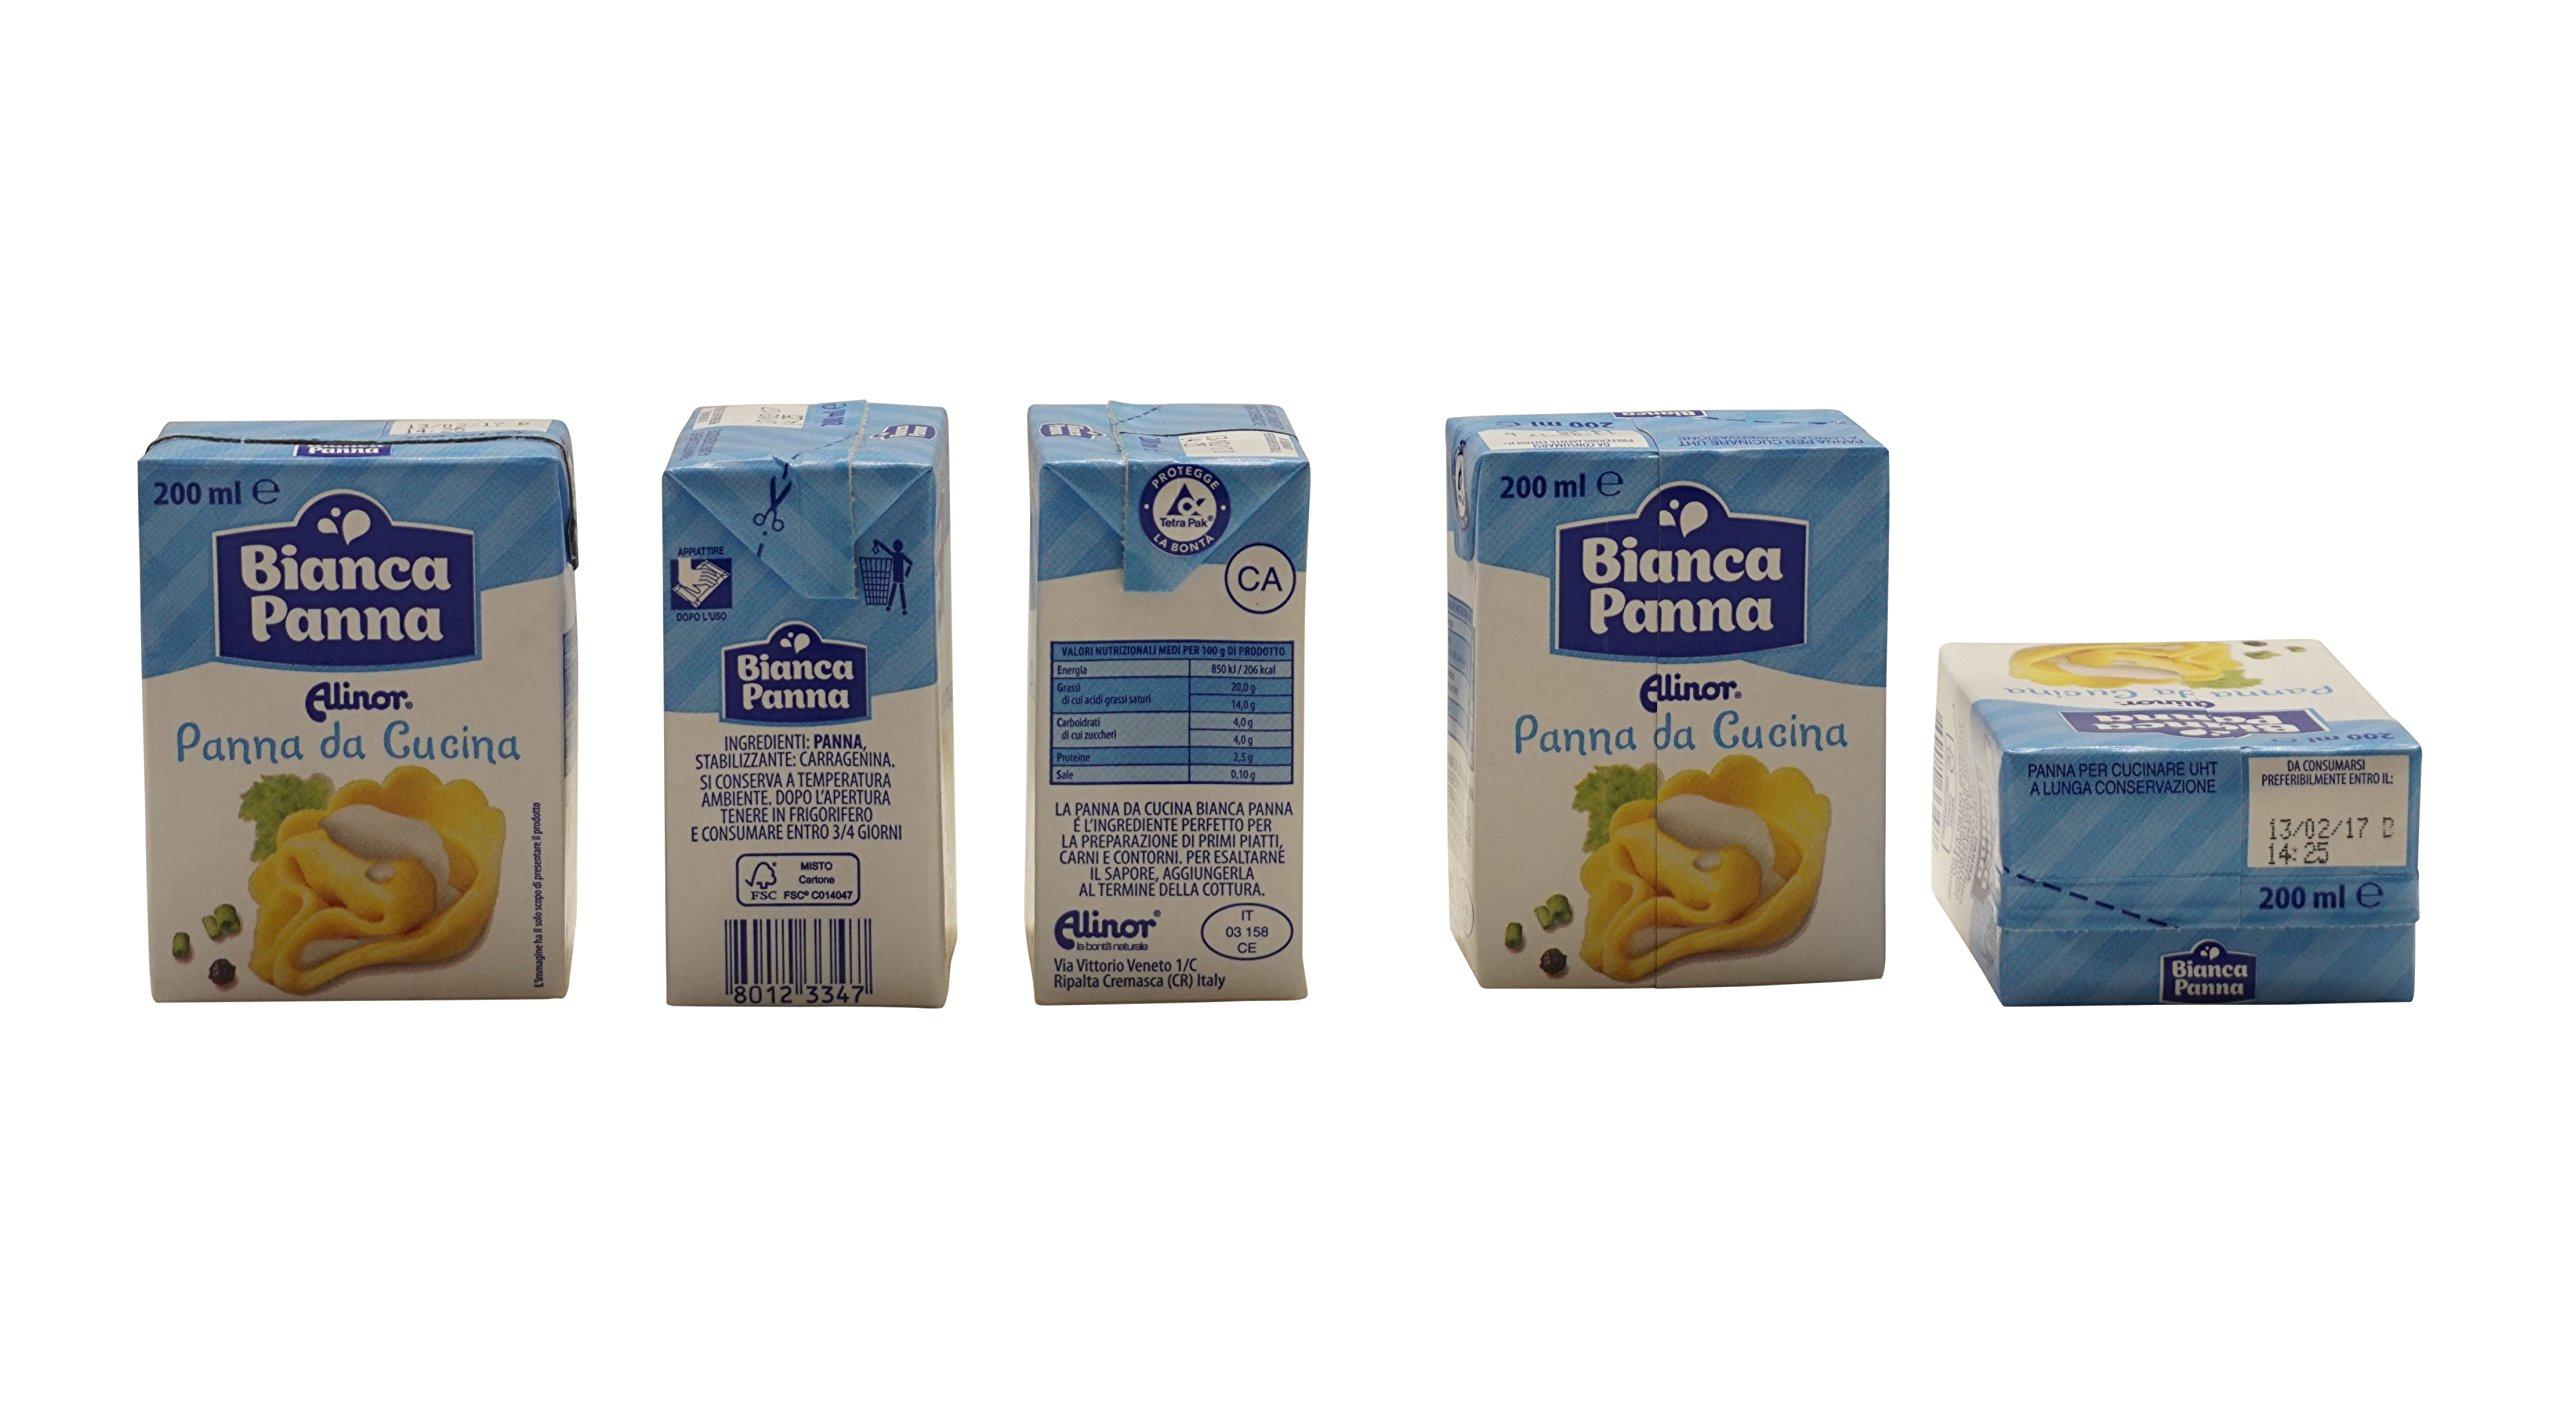 Alinor: Italian ''Panna Da Cucina'', UHT Cooking Cream * 6.7 Fluid Ounce (200ml) Packages (Pack of 4) * [ Italian Import ] by Alinor (Image #7)